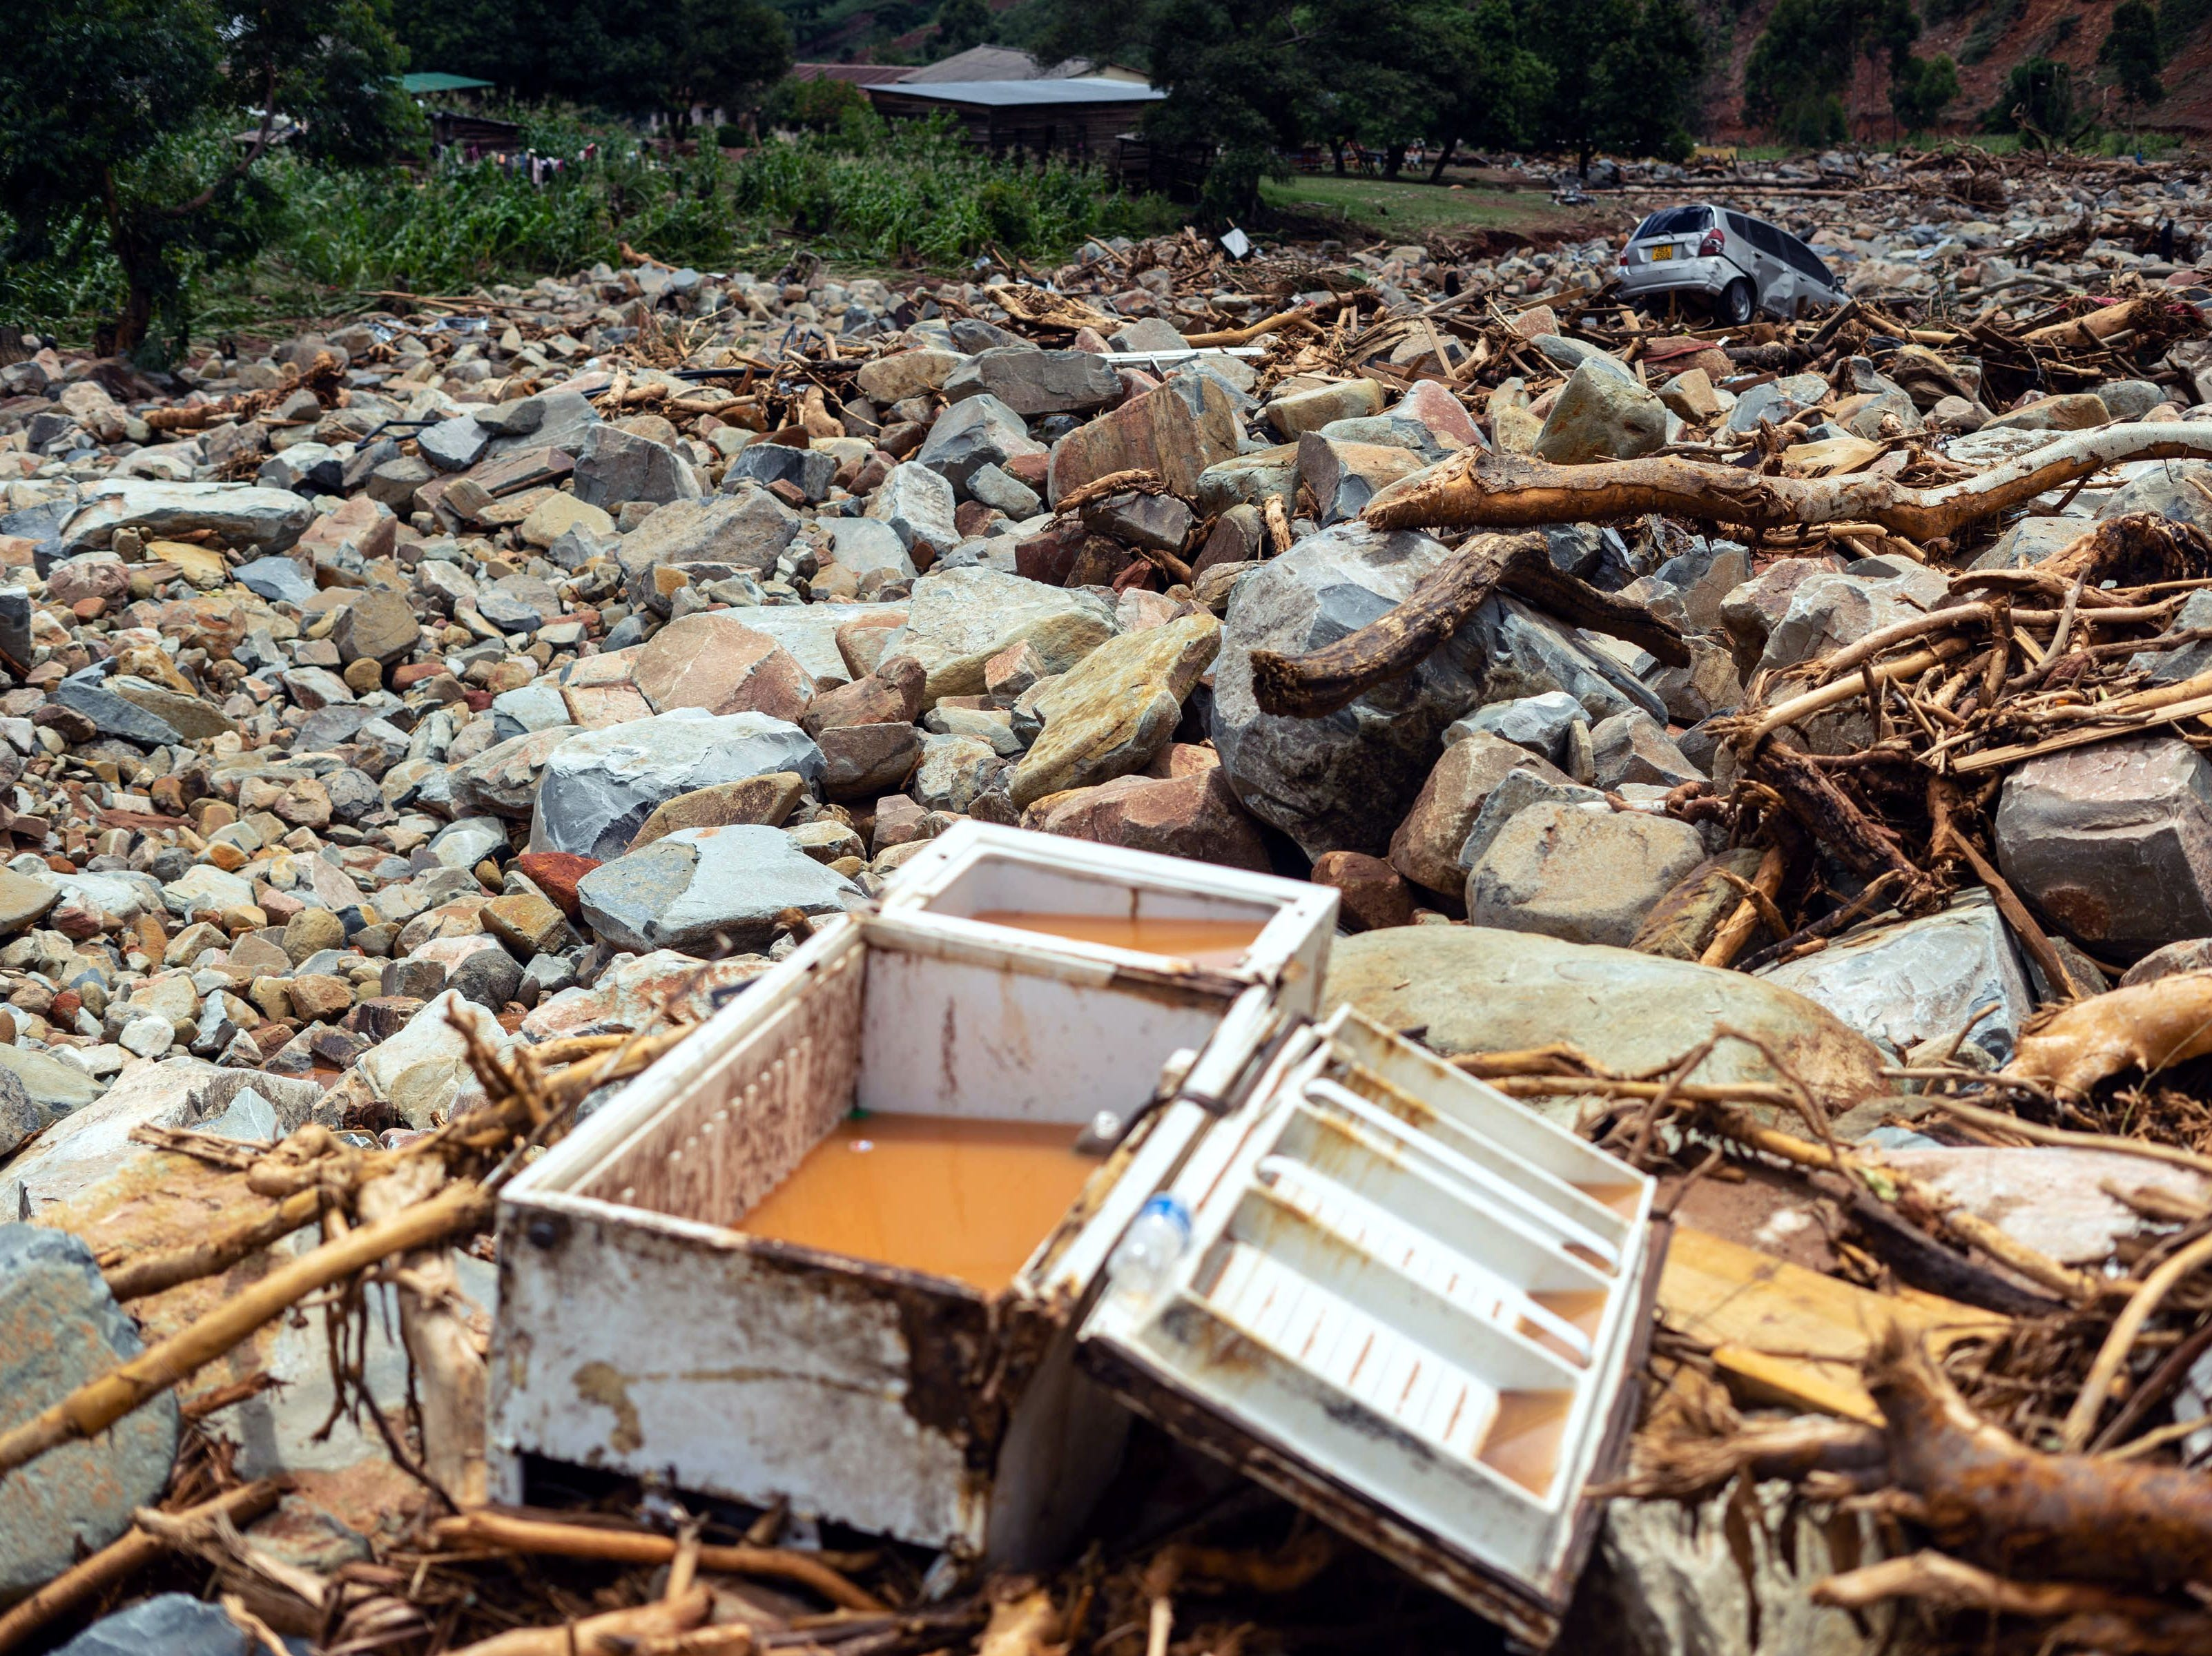 A demolished fridge sits among the rocks and debris  after Chimanimani, Zimbabwe, was hit by the cyclone Idai.